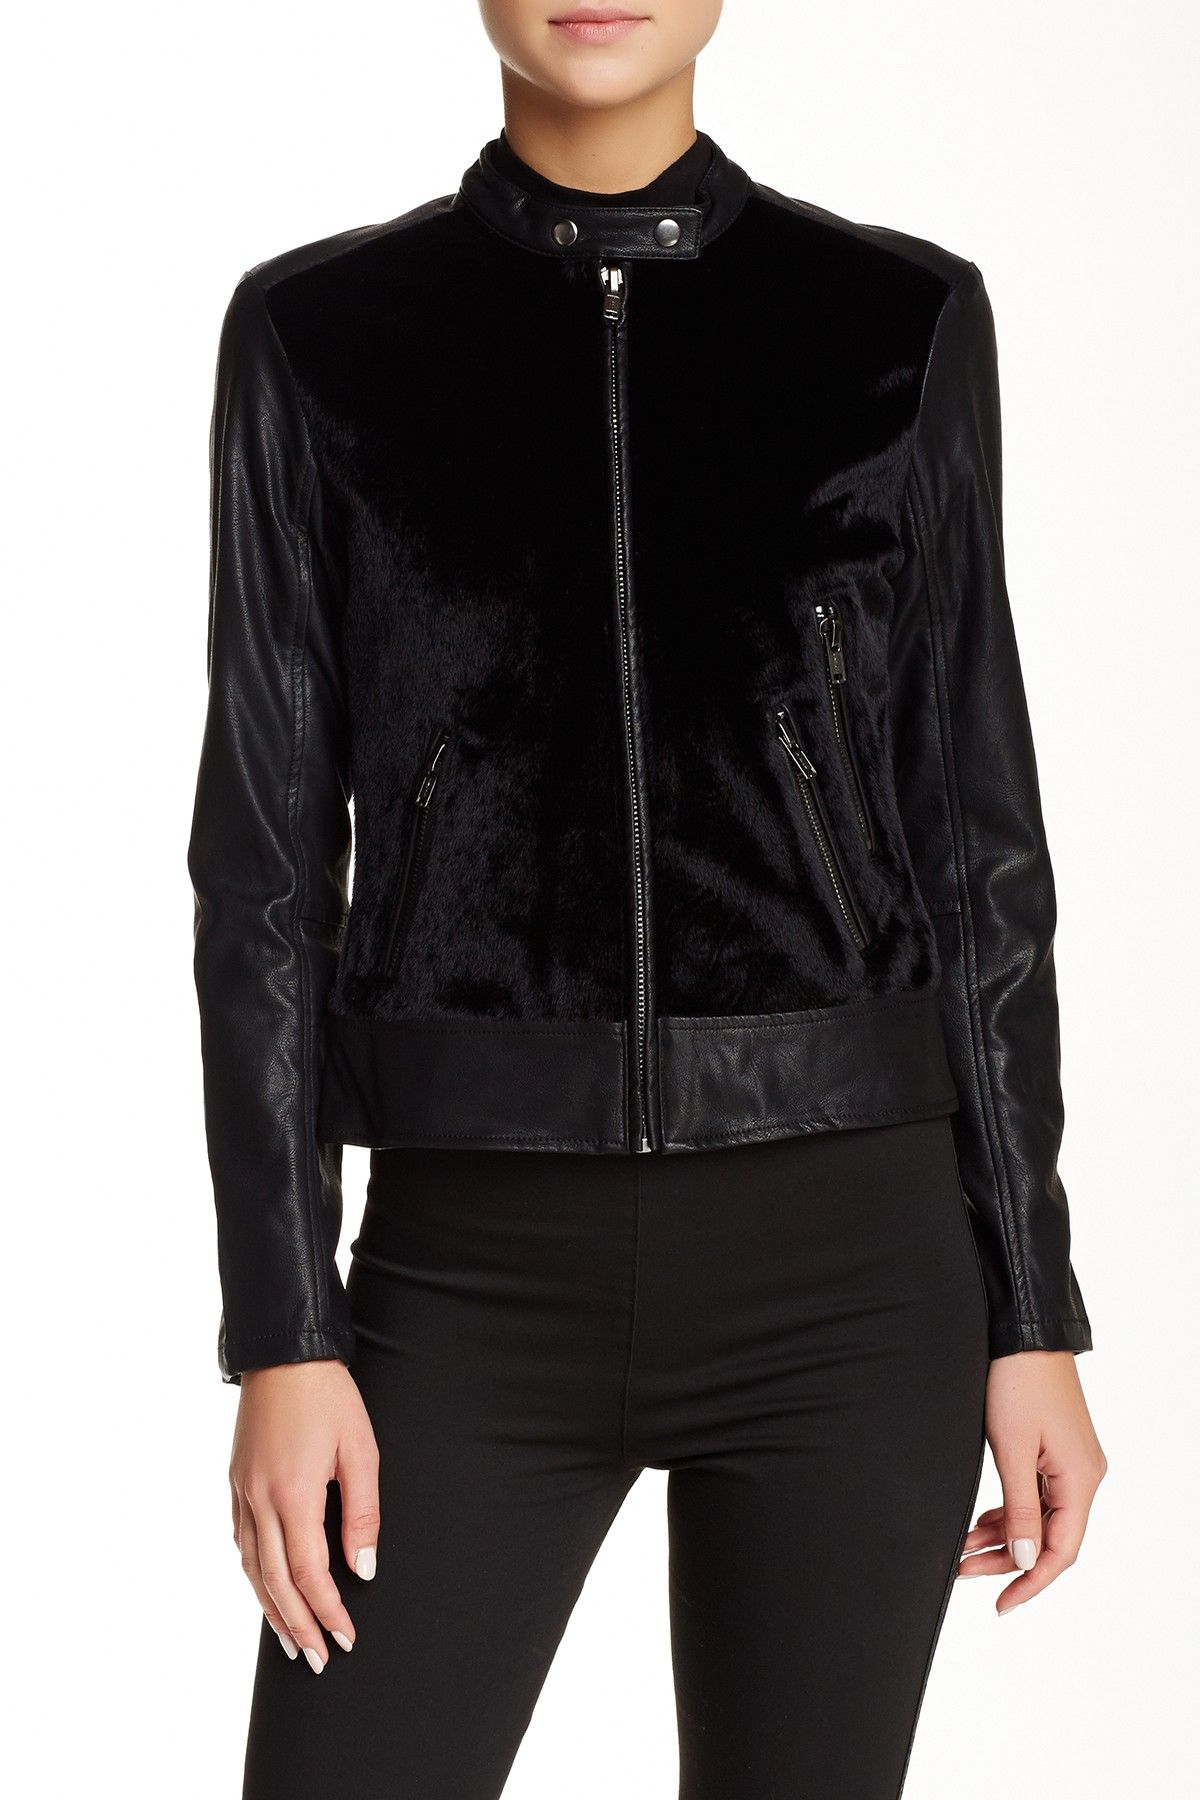 BLANKNYC Denim Faux Leather and Faux Fur Moto Jacket